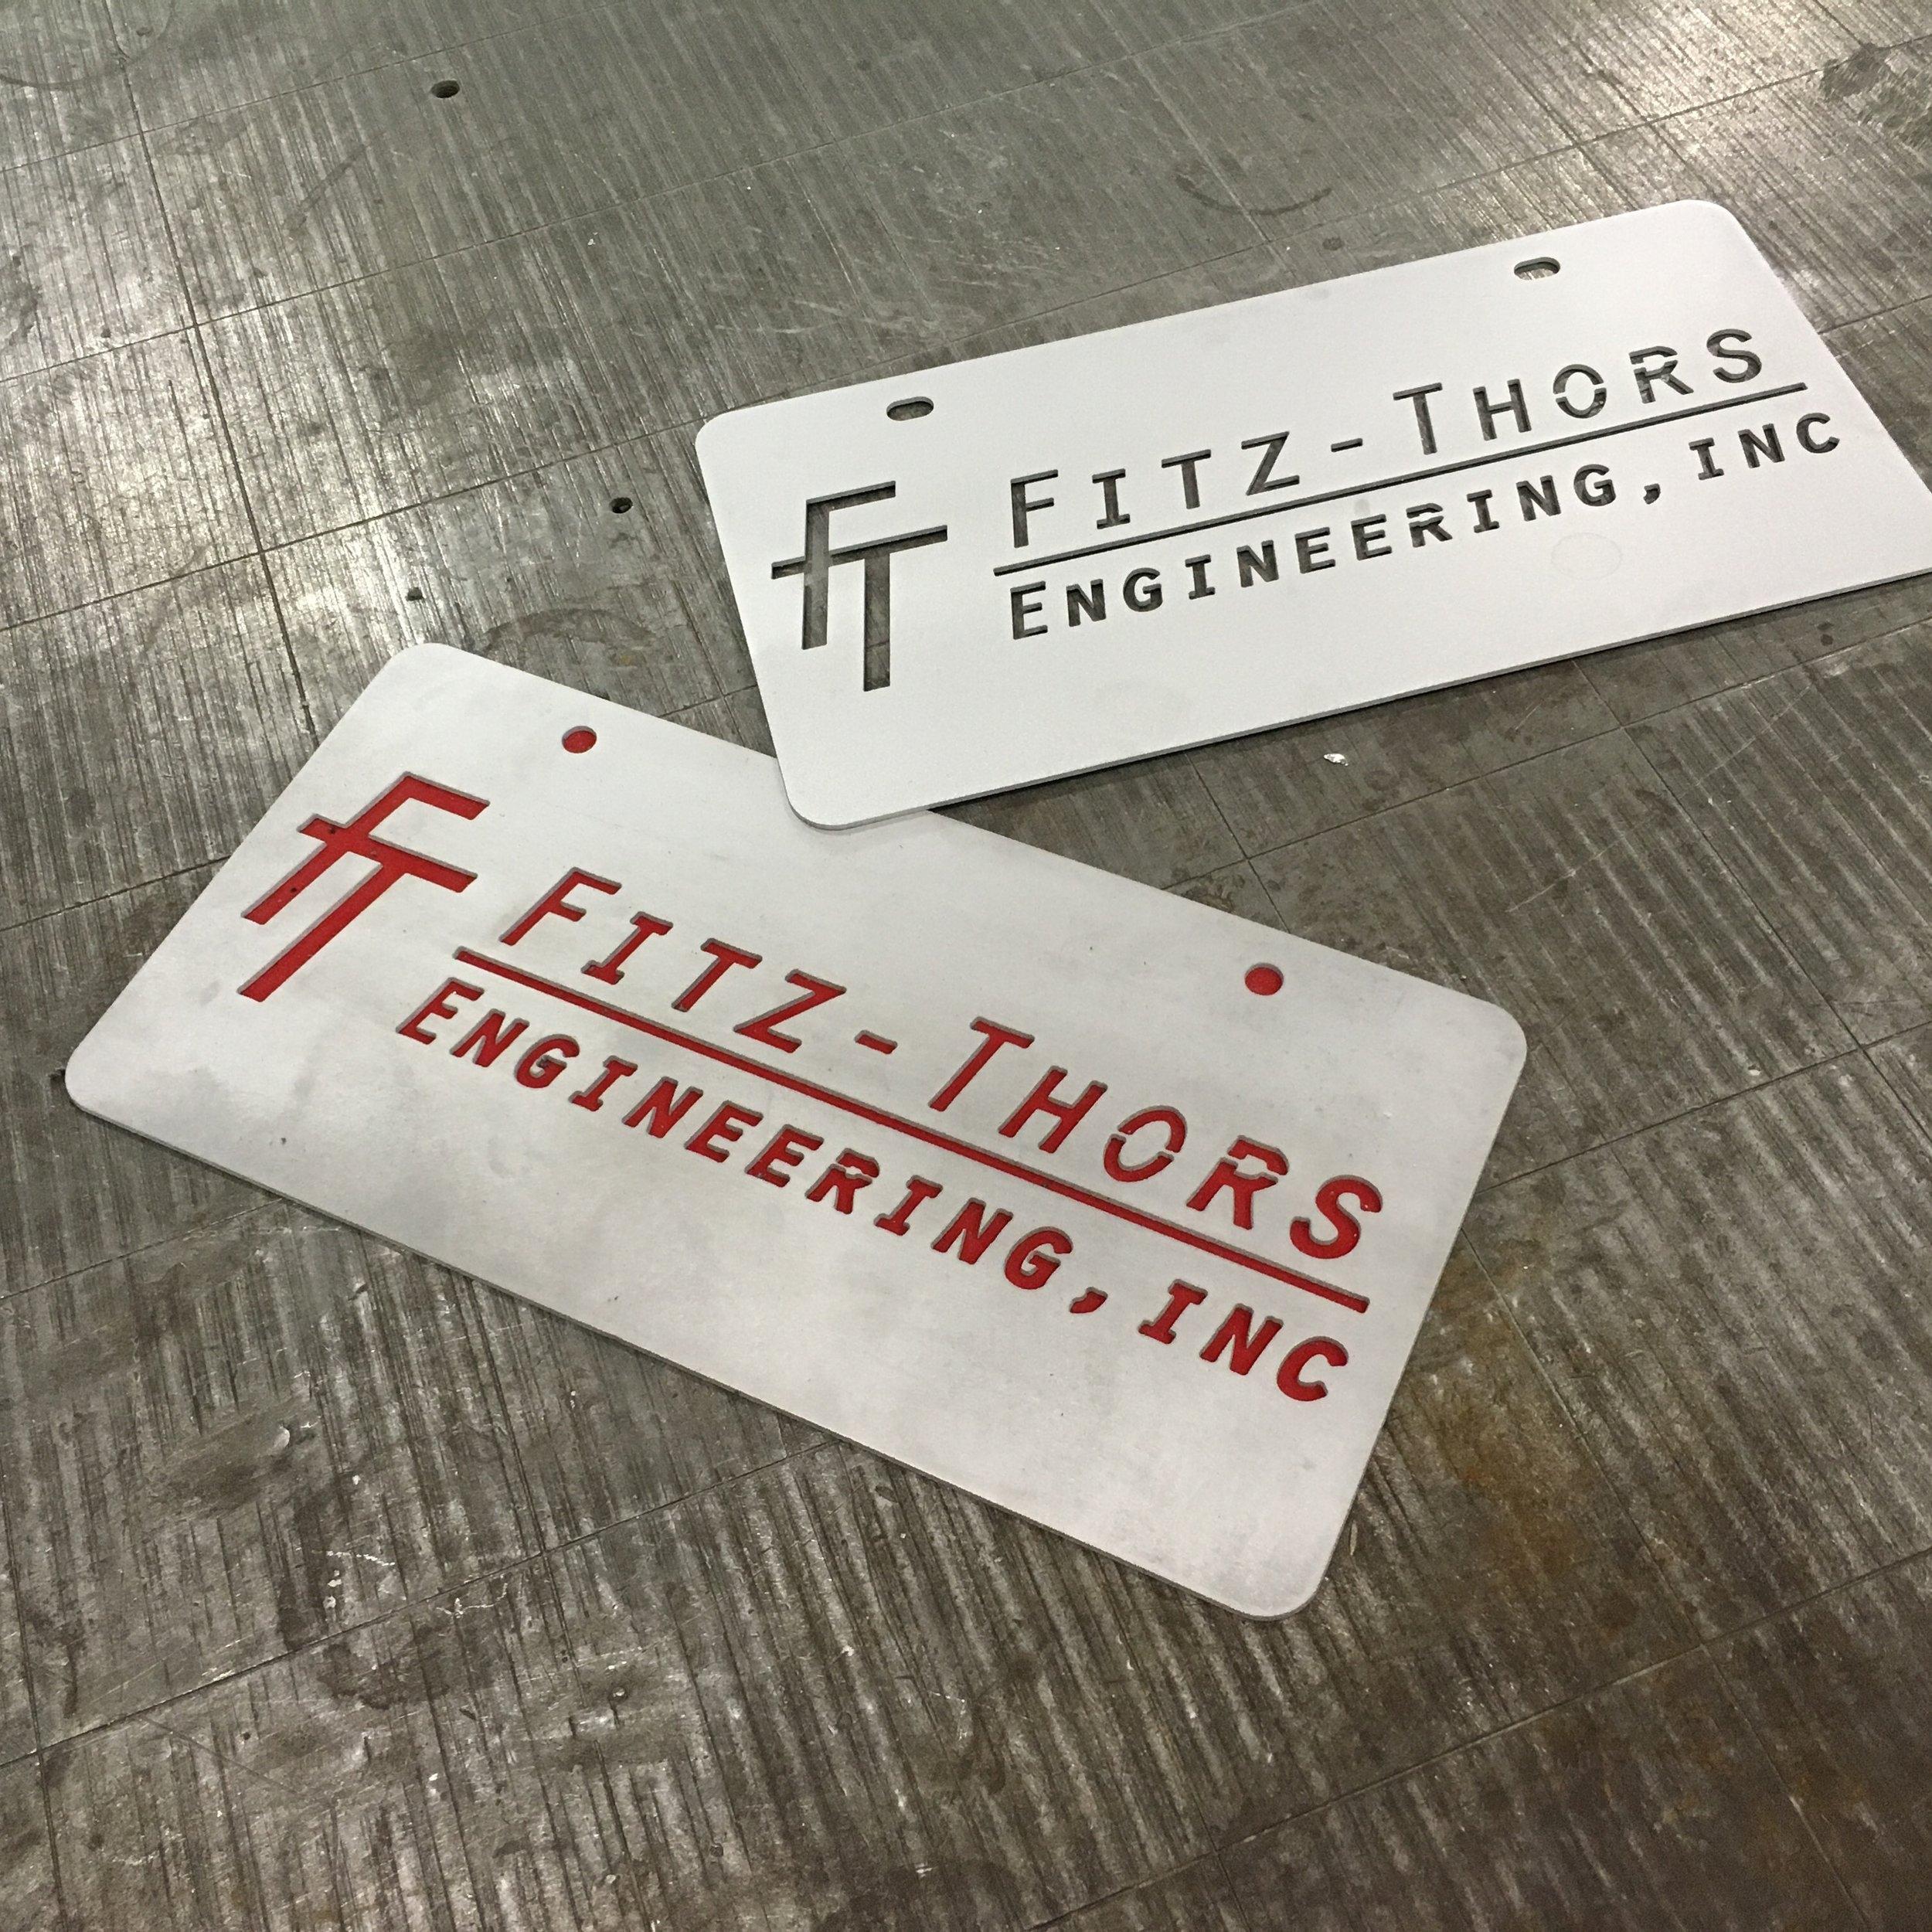 Fitz-Thors-Engineering_manufacturing_waterjet_logo_license-plates.JPG